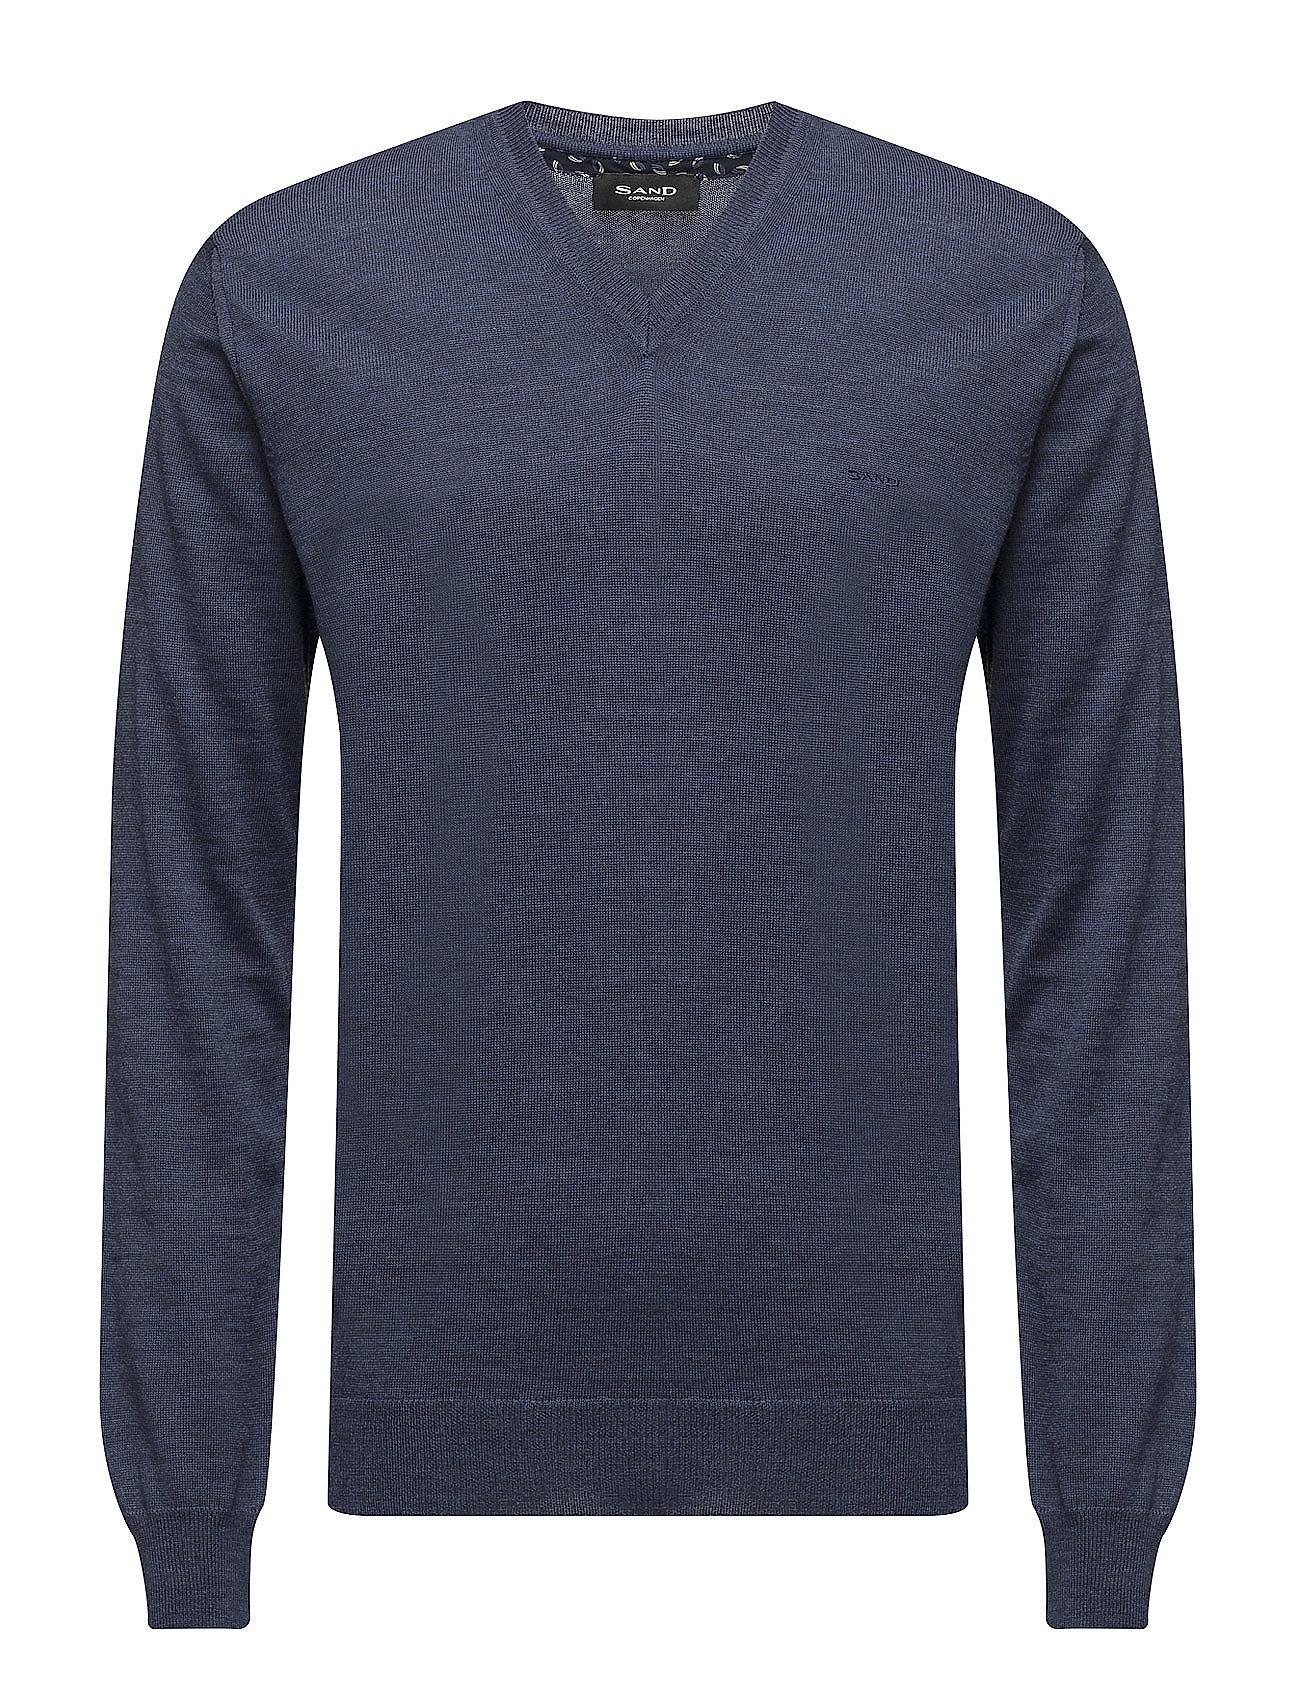 Merino Embroidery - Iv SAND V-halsede til Herrer i Medium Blå